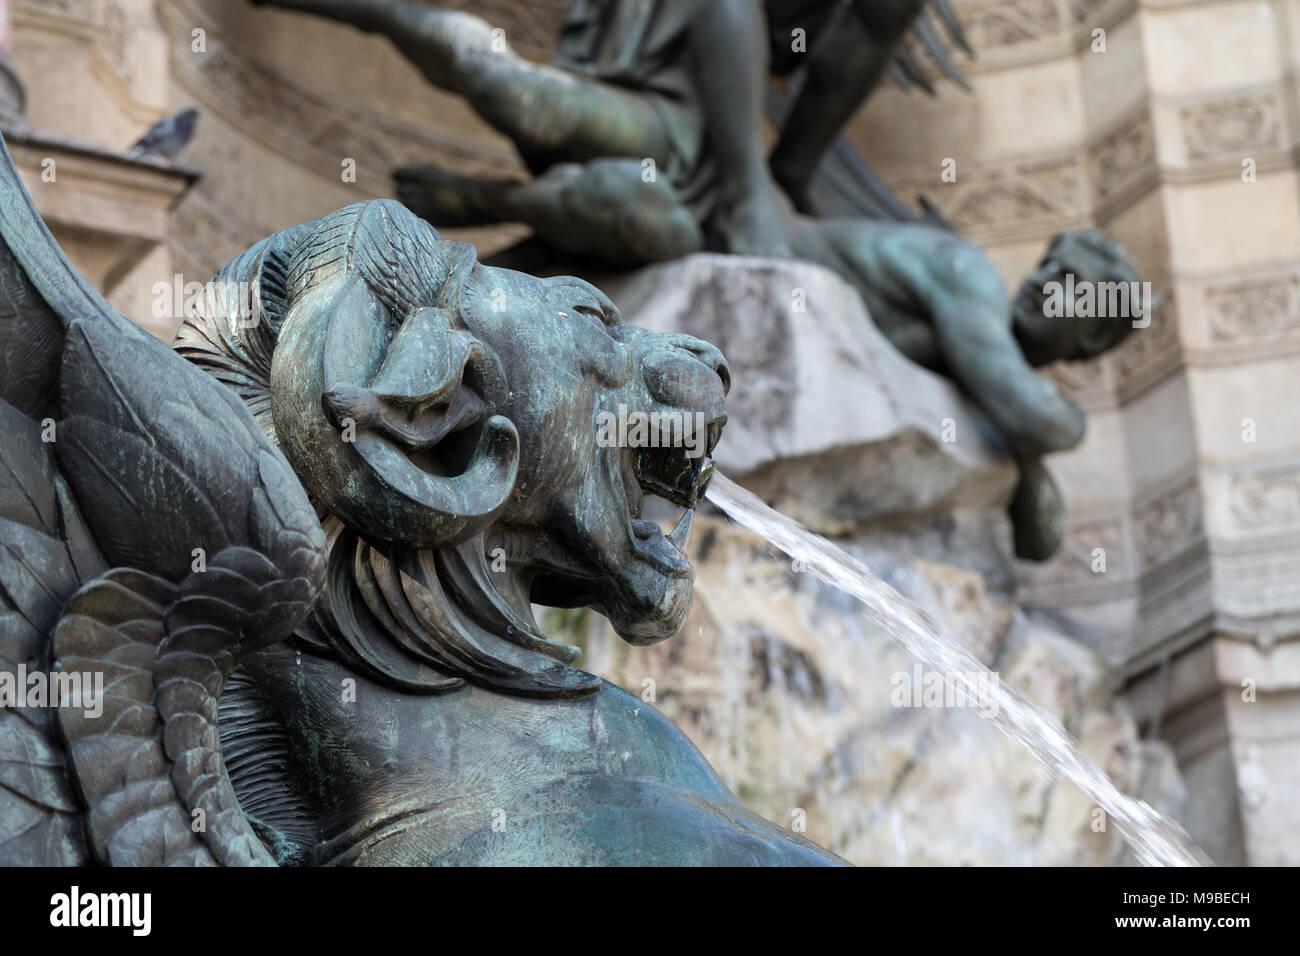 statues of Fountain Saint Michel in Paris - Stock Image